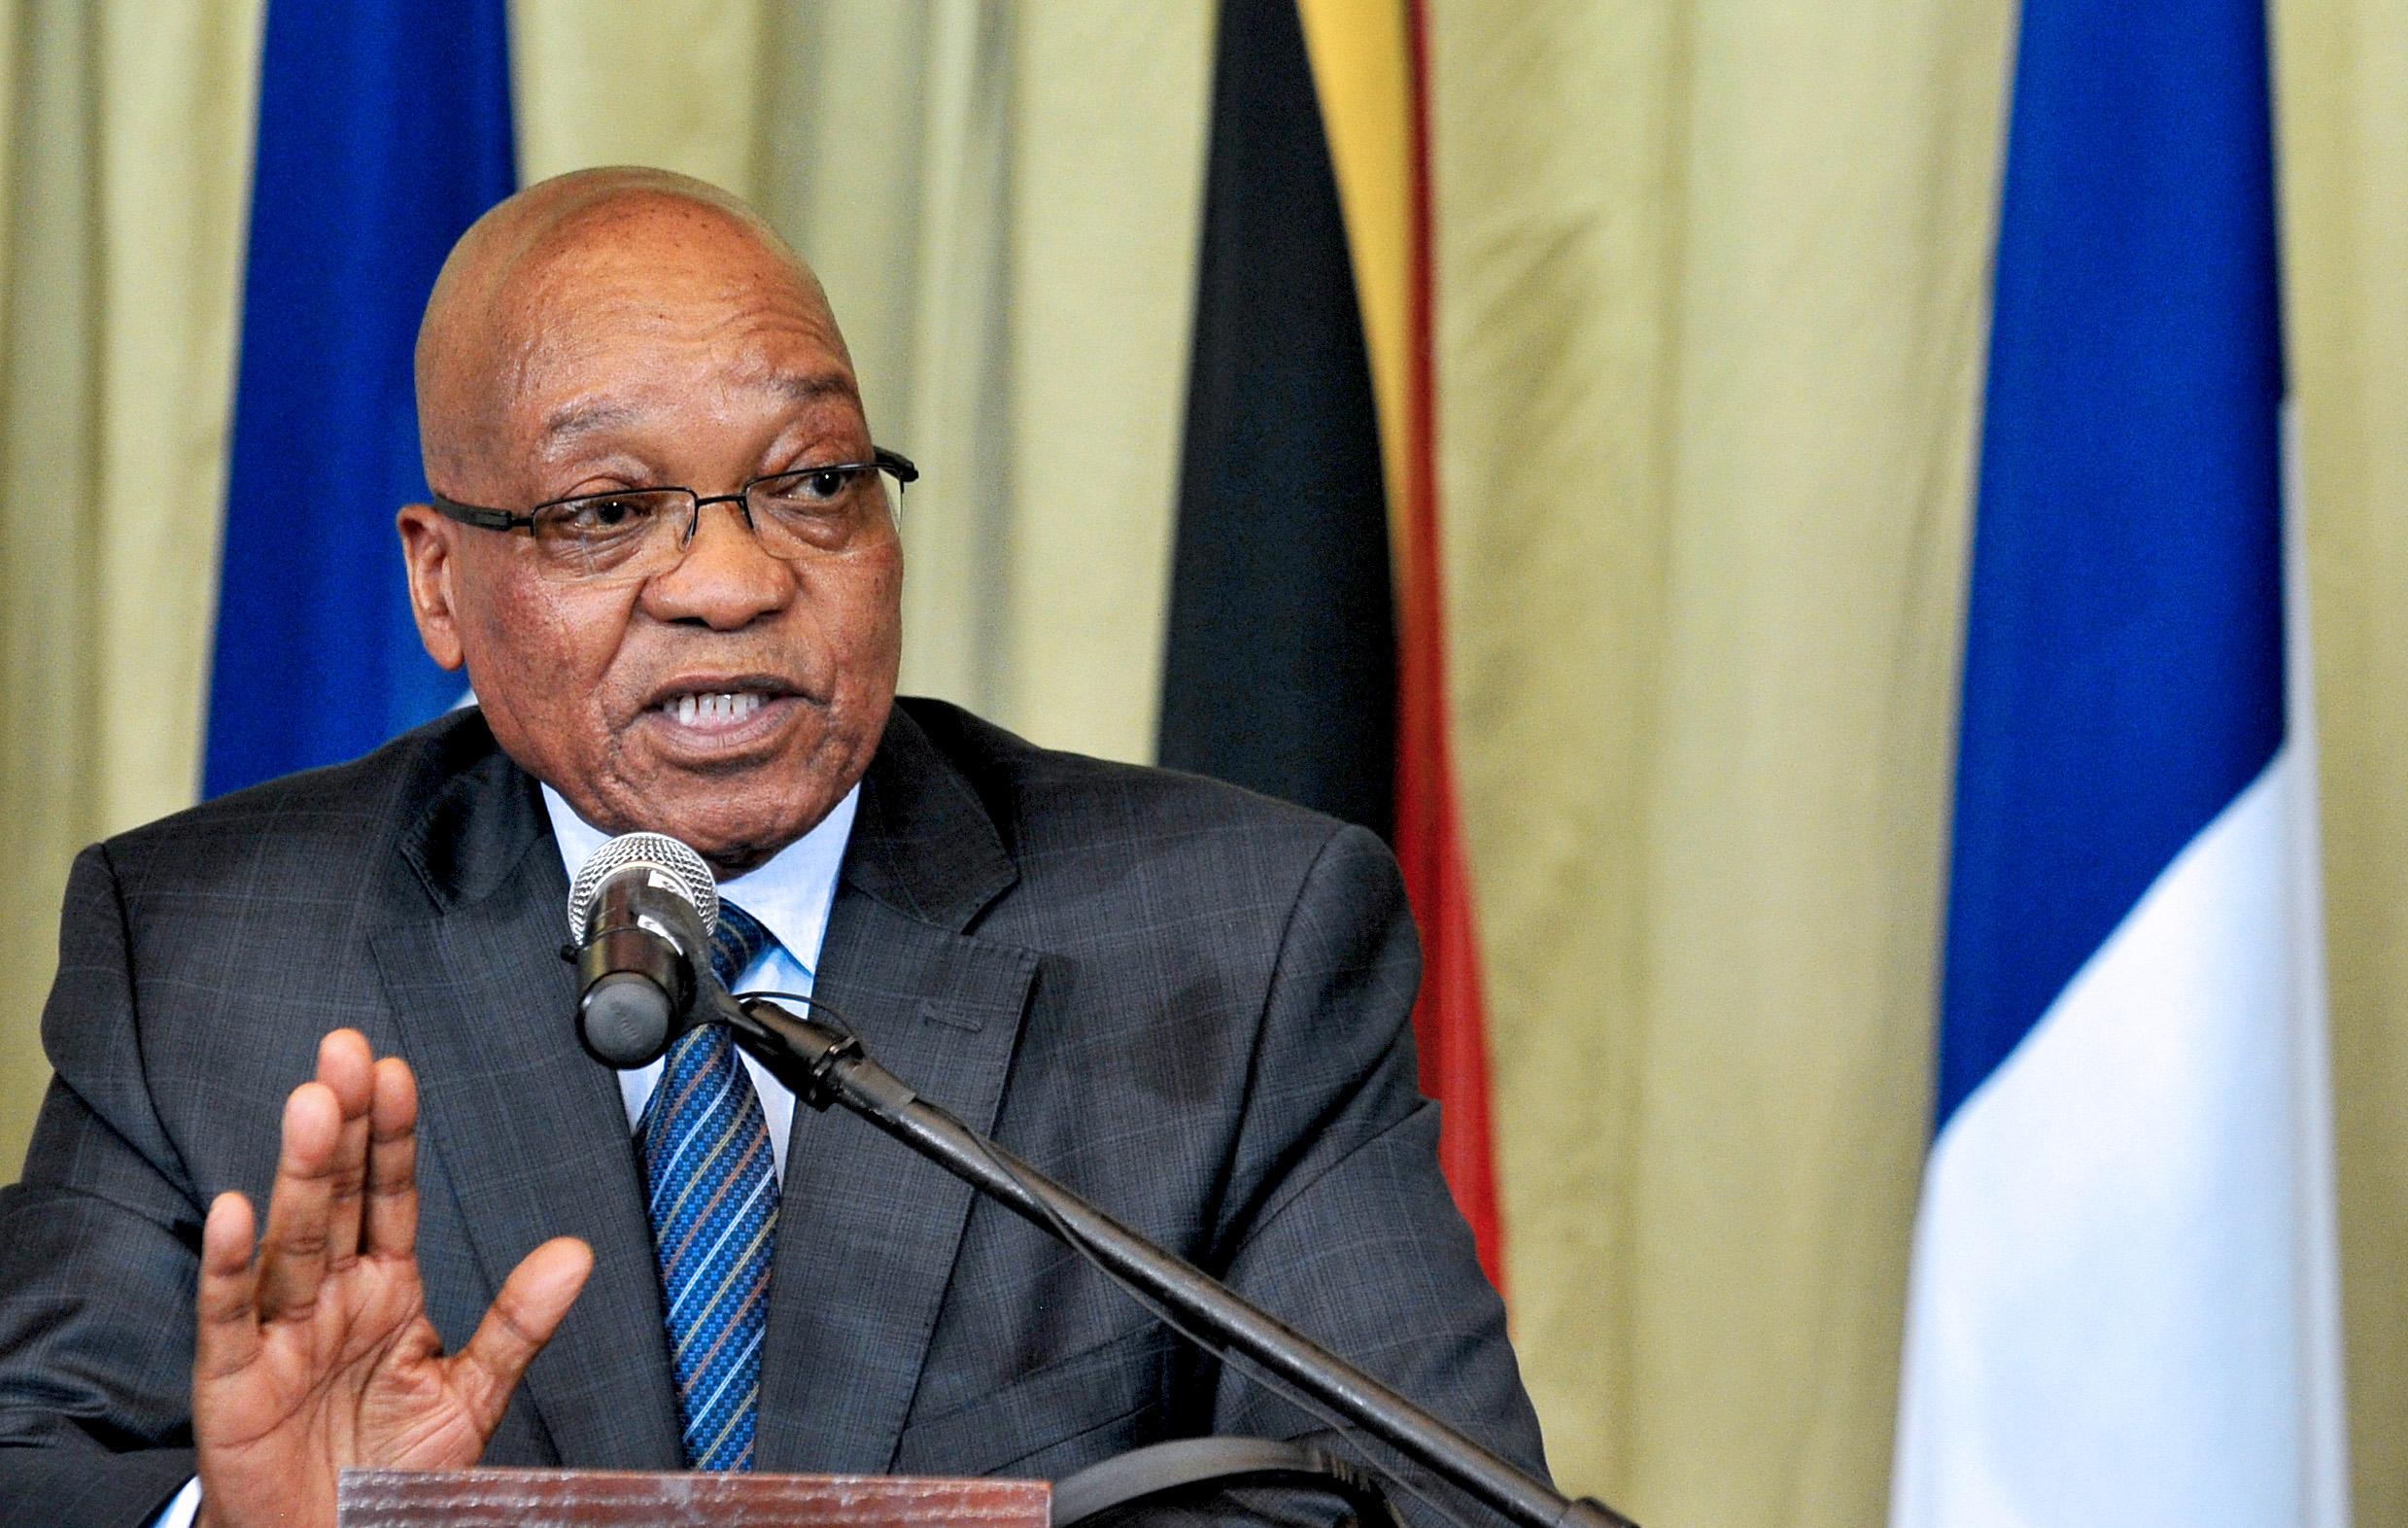 Zuma Insults Malawi, Sheds Light on South Africa